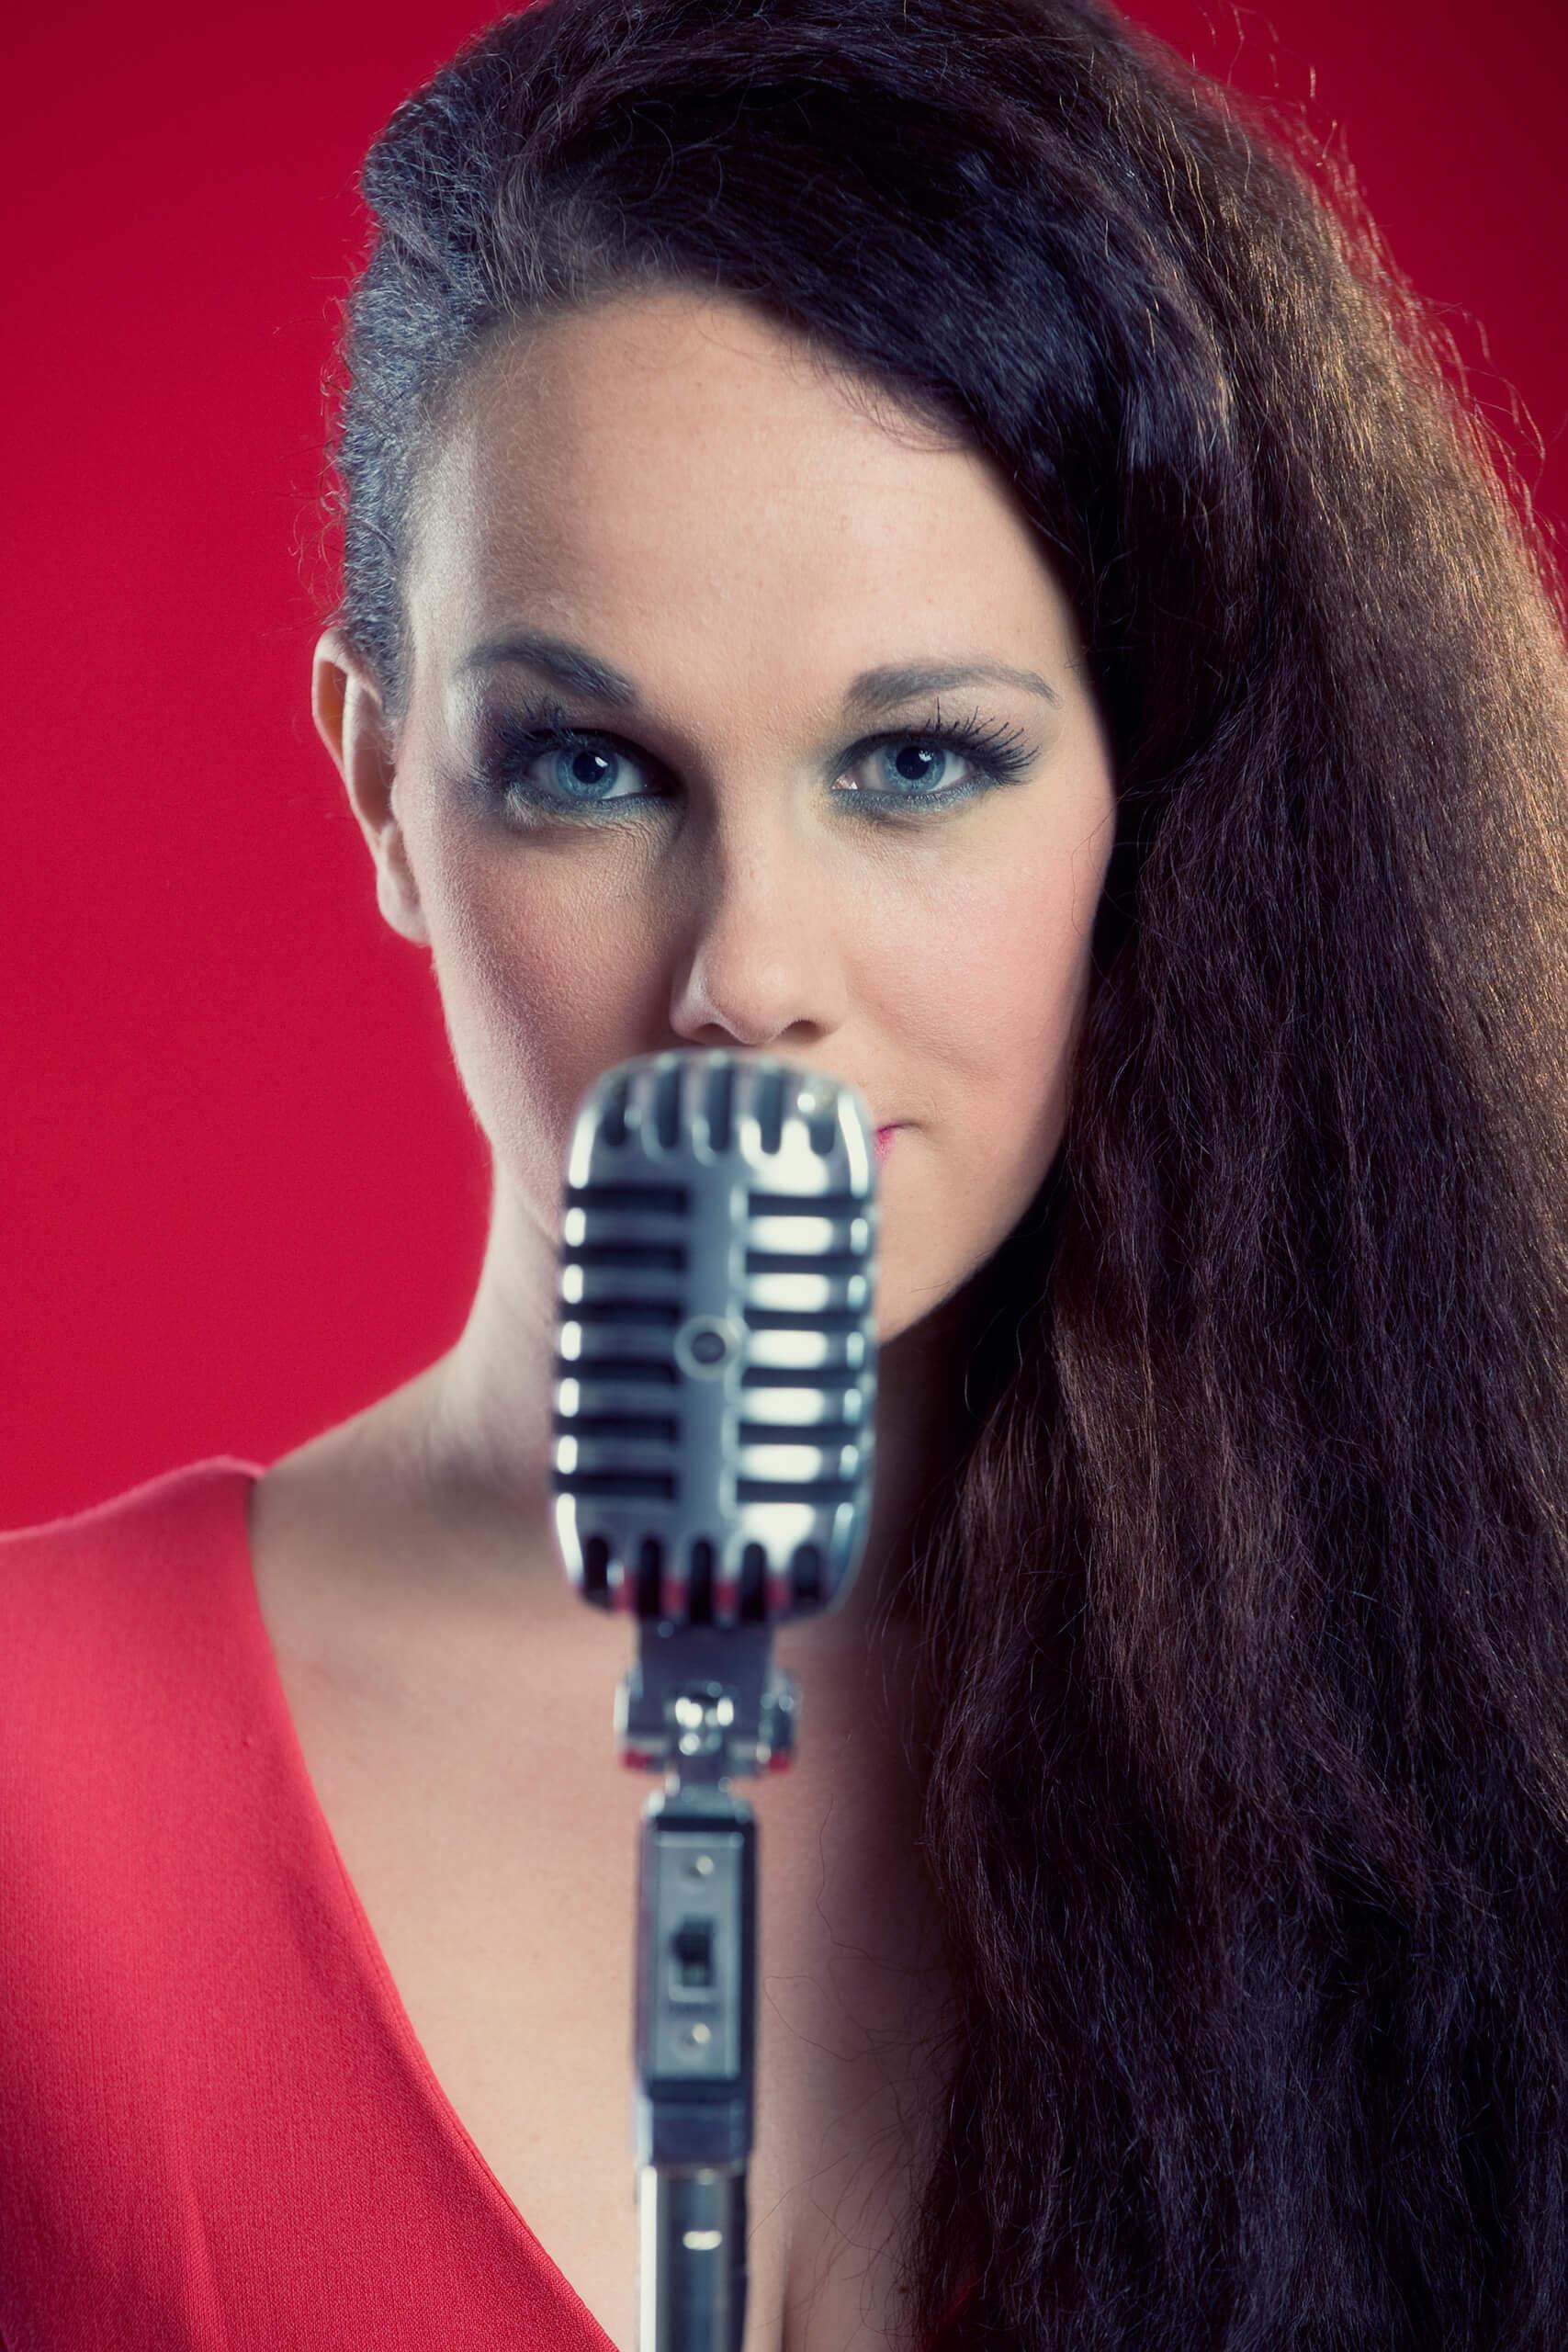 zangeres Anja DalHuijsen